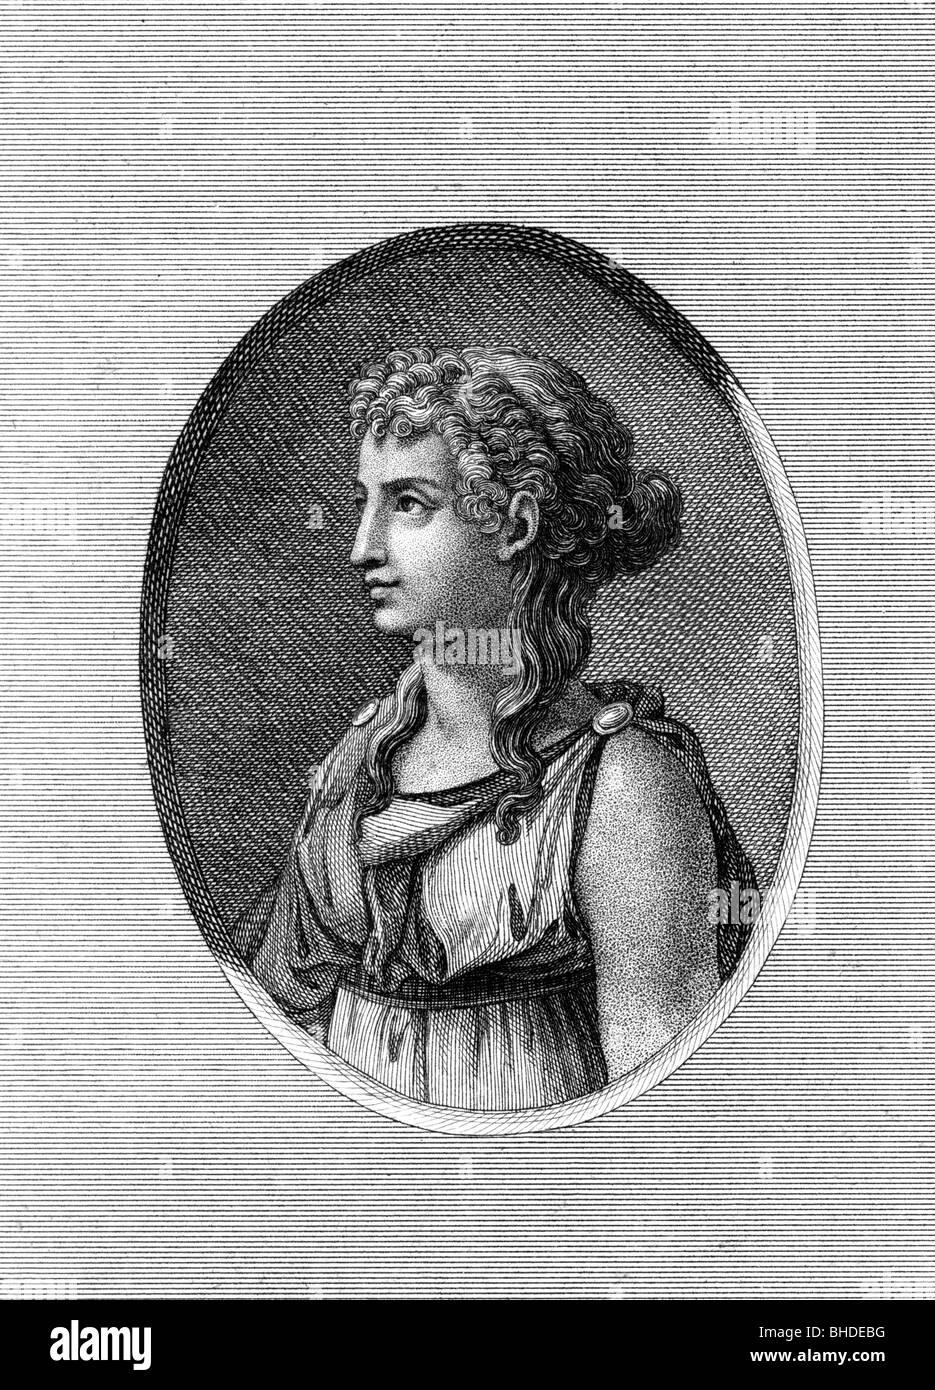 Sappho, Ancient Greek lyric poet, circa 620 BC - circa 570 BC, portrait, copper engraving, circa 18th century, Artist's - Stock Image